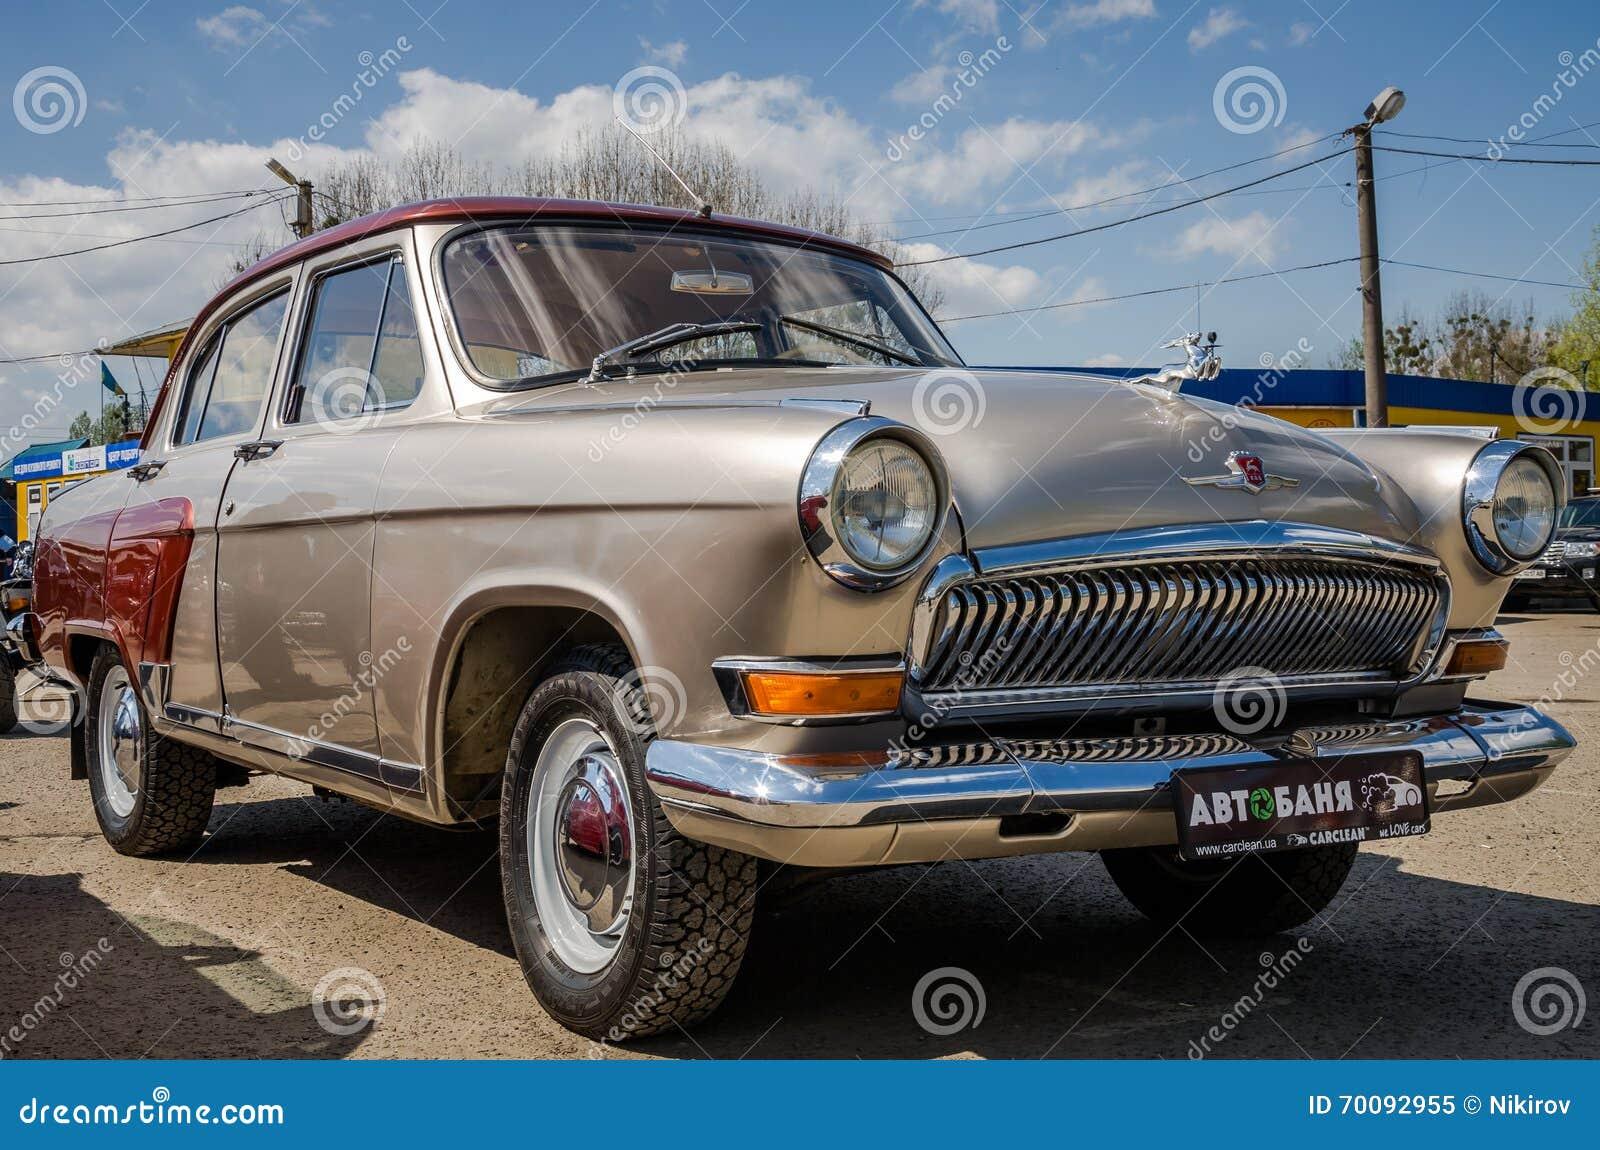 Very vintage car chrome think, that